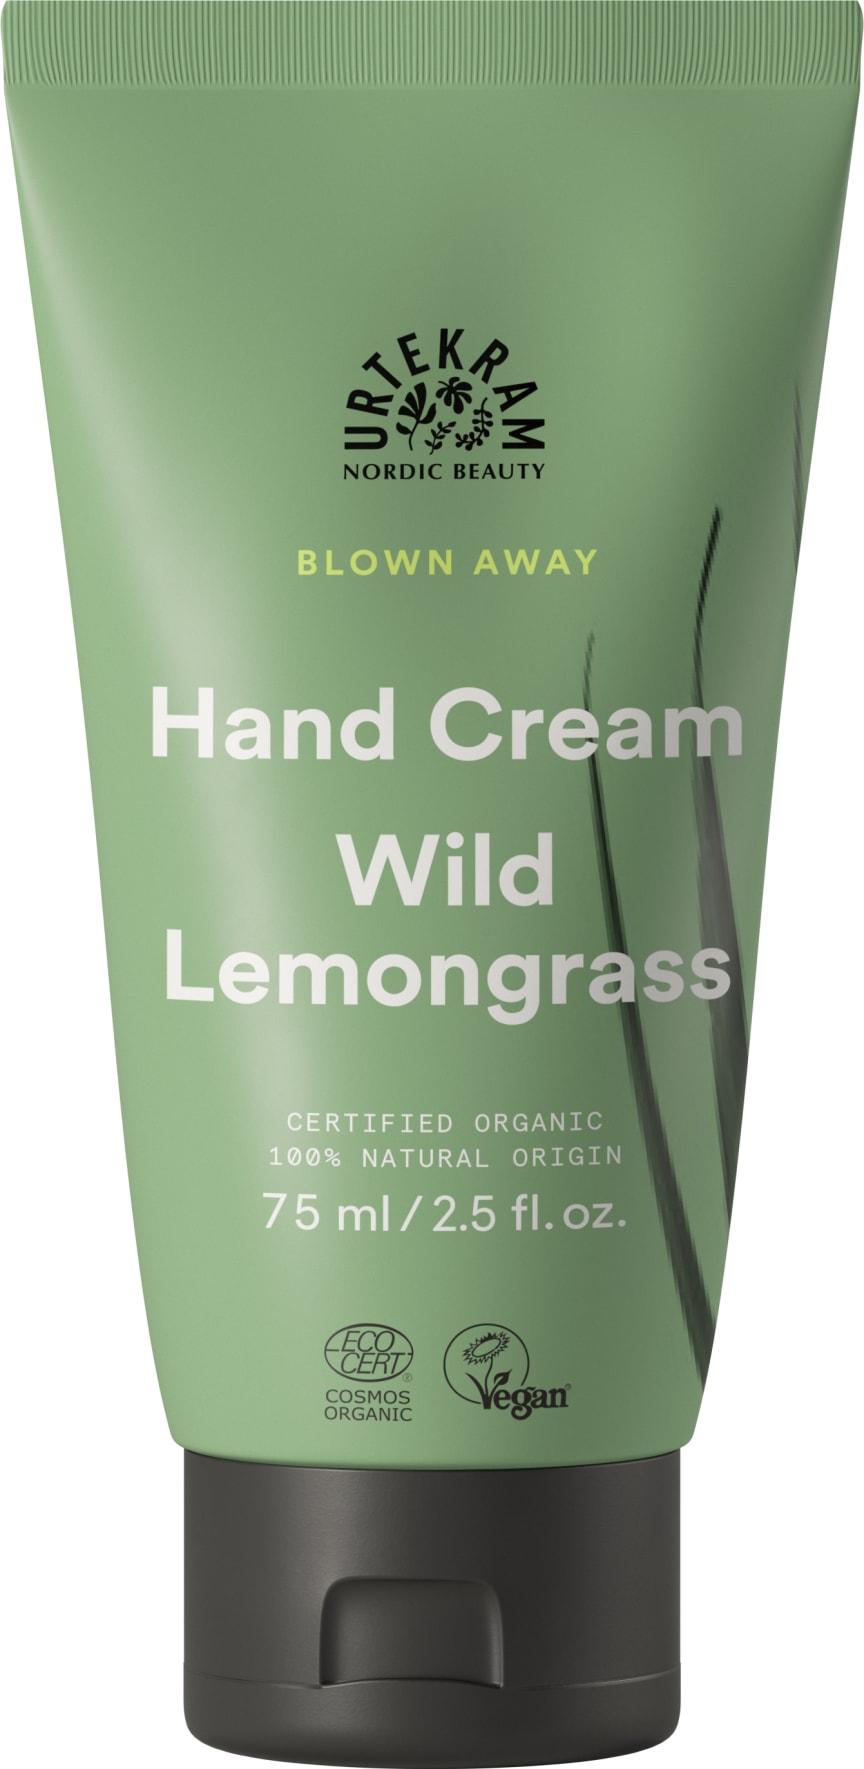 BLOWN AWAY Hand Cream